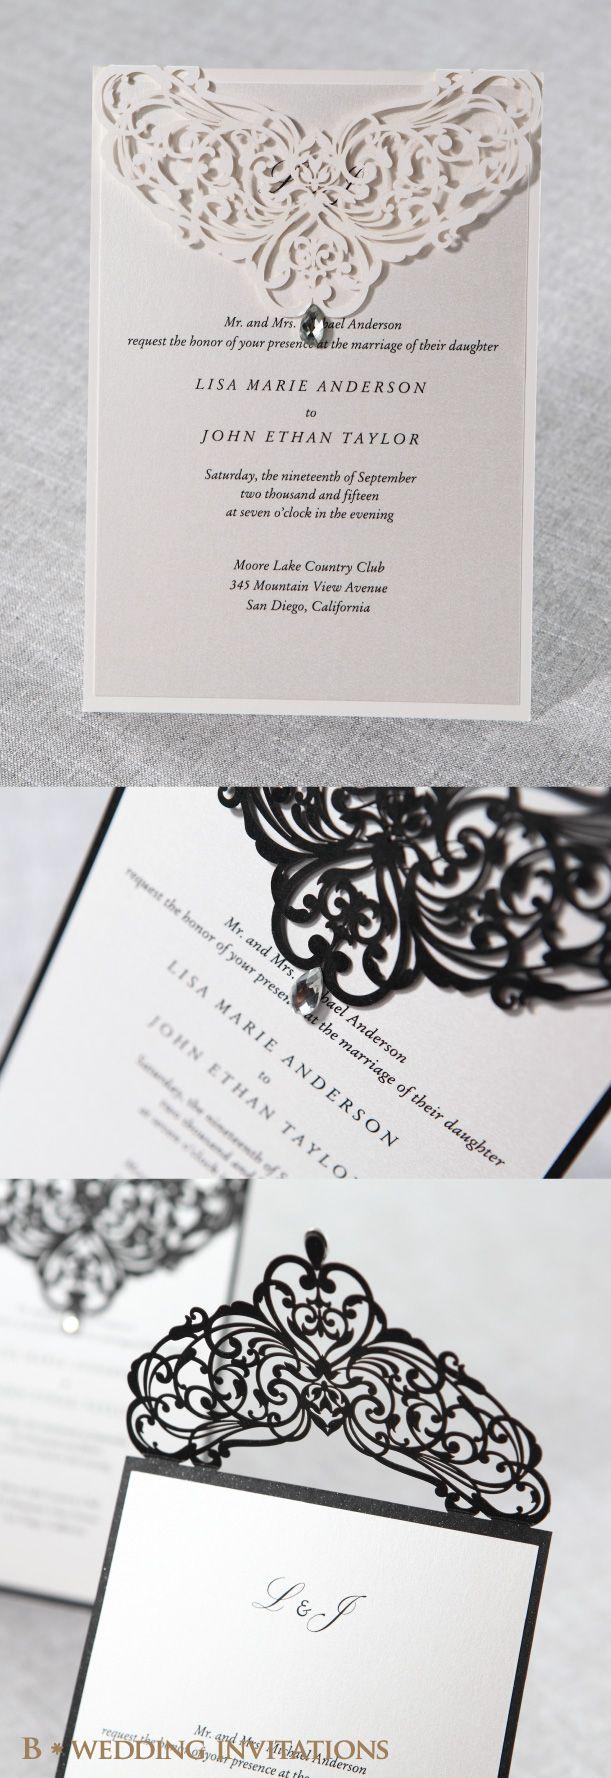 Jeweled Romance Laser Cut by B Wedding Invitations#jeweledinvitation